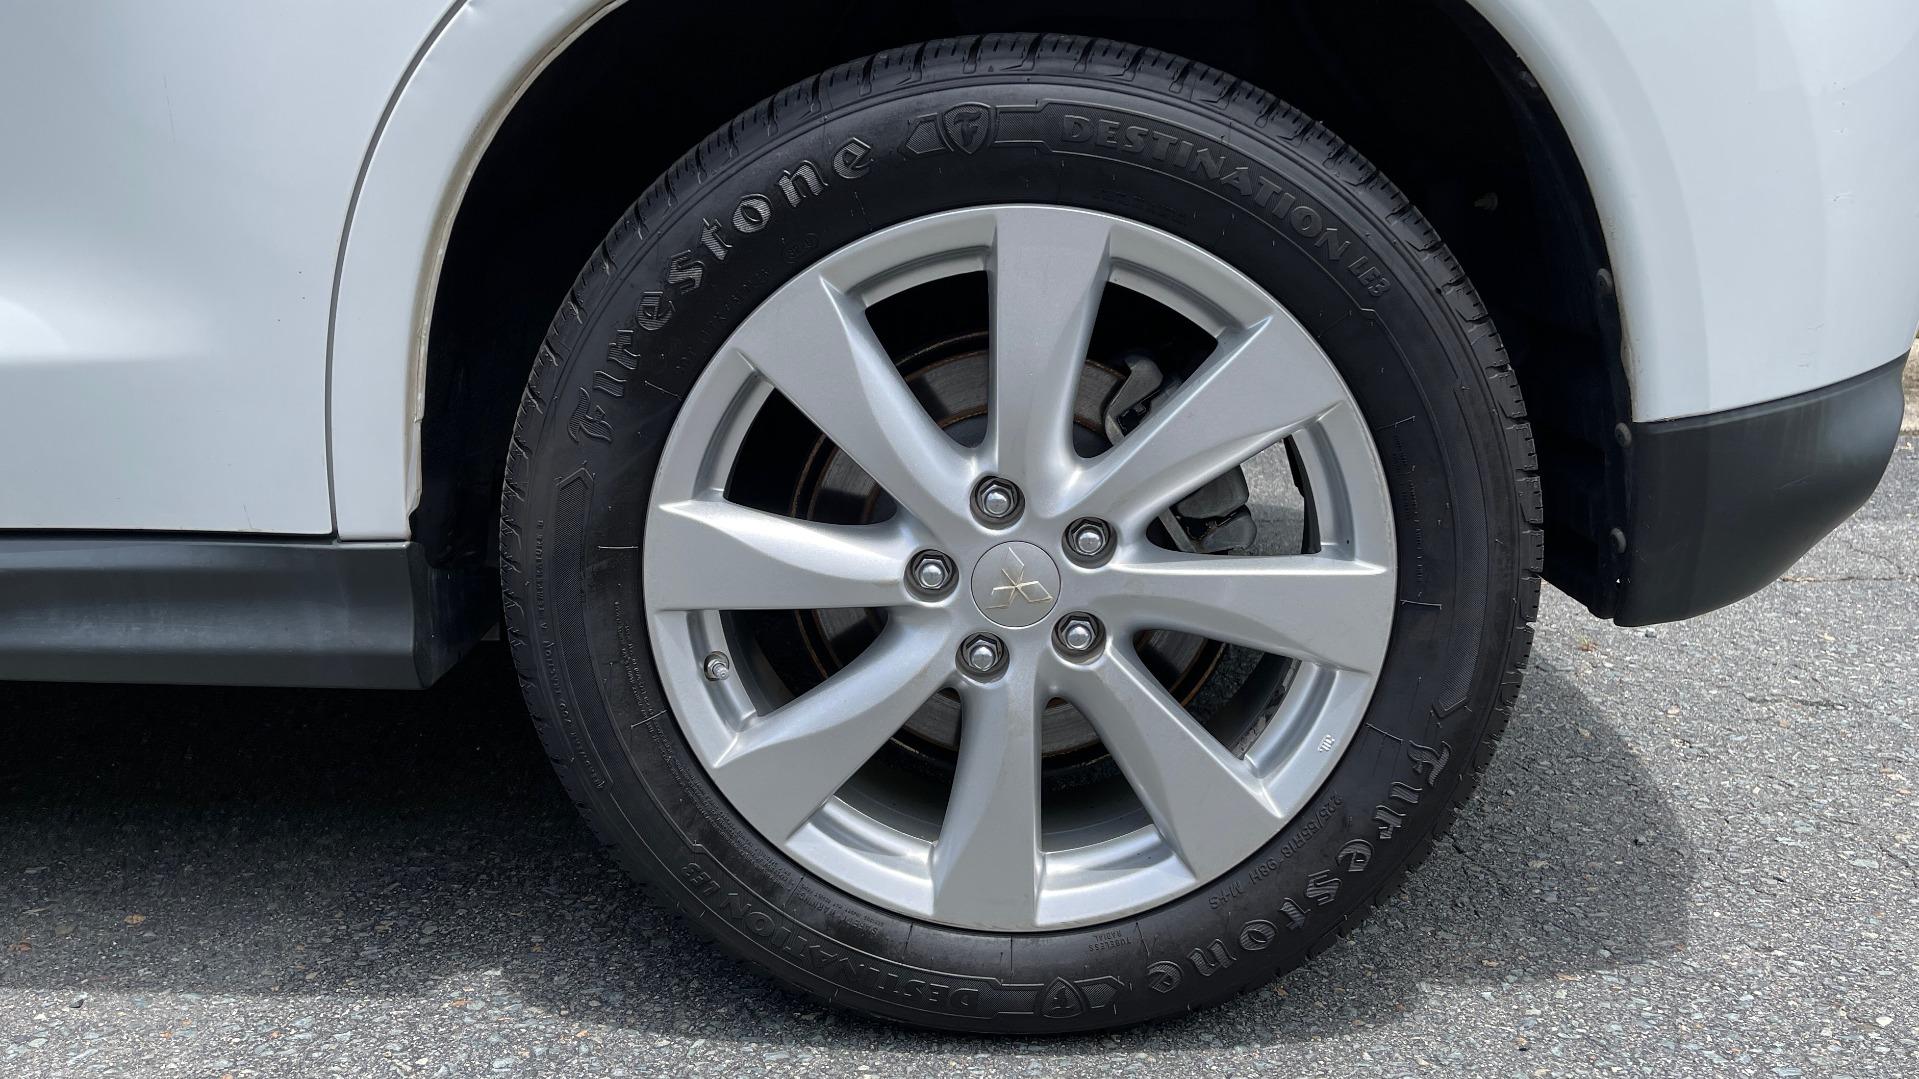 Used 2014 Mitsubishi OUTLANDER SPORT ES 2WD / 2.0L / CVT TRANS / 18IN WHEELS / 31MPG for sale $8,495 at Formula Imports in Charlotte NC 28227 56